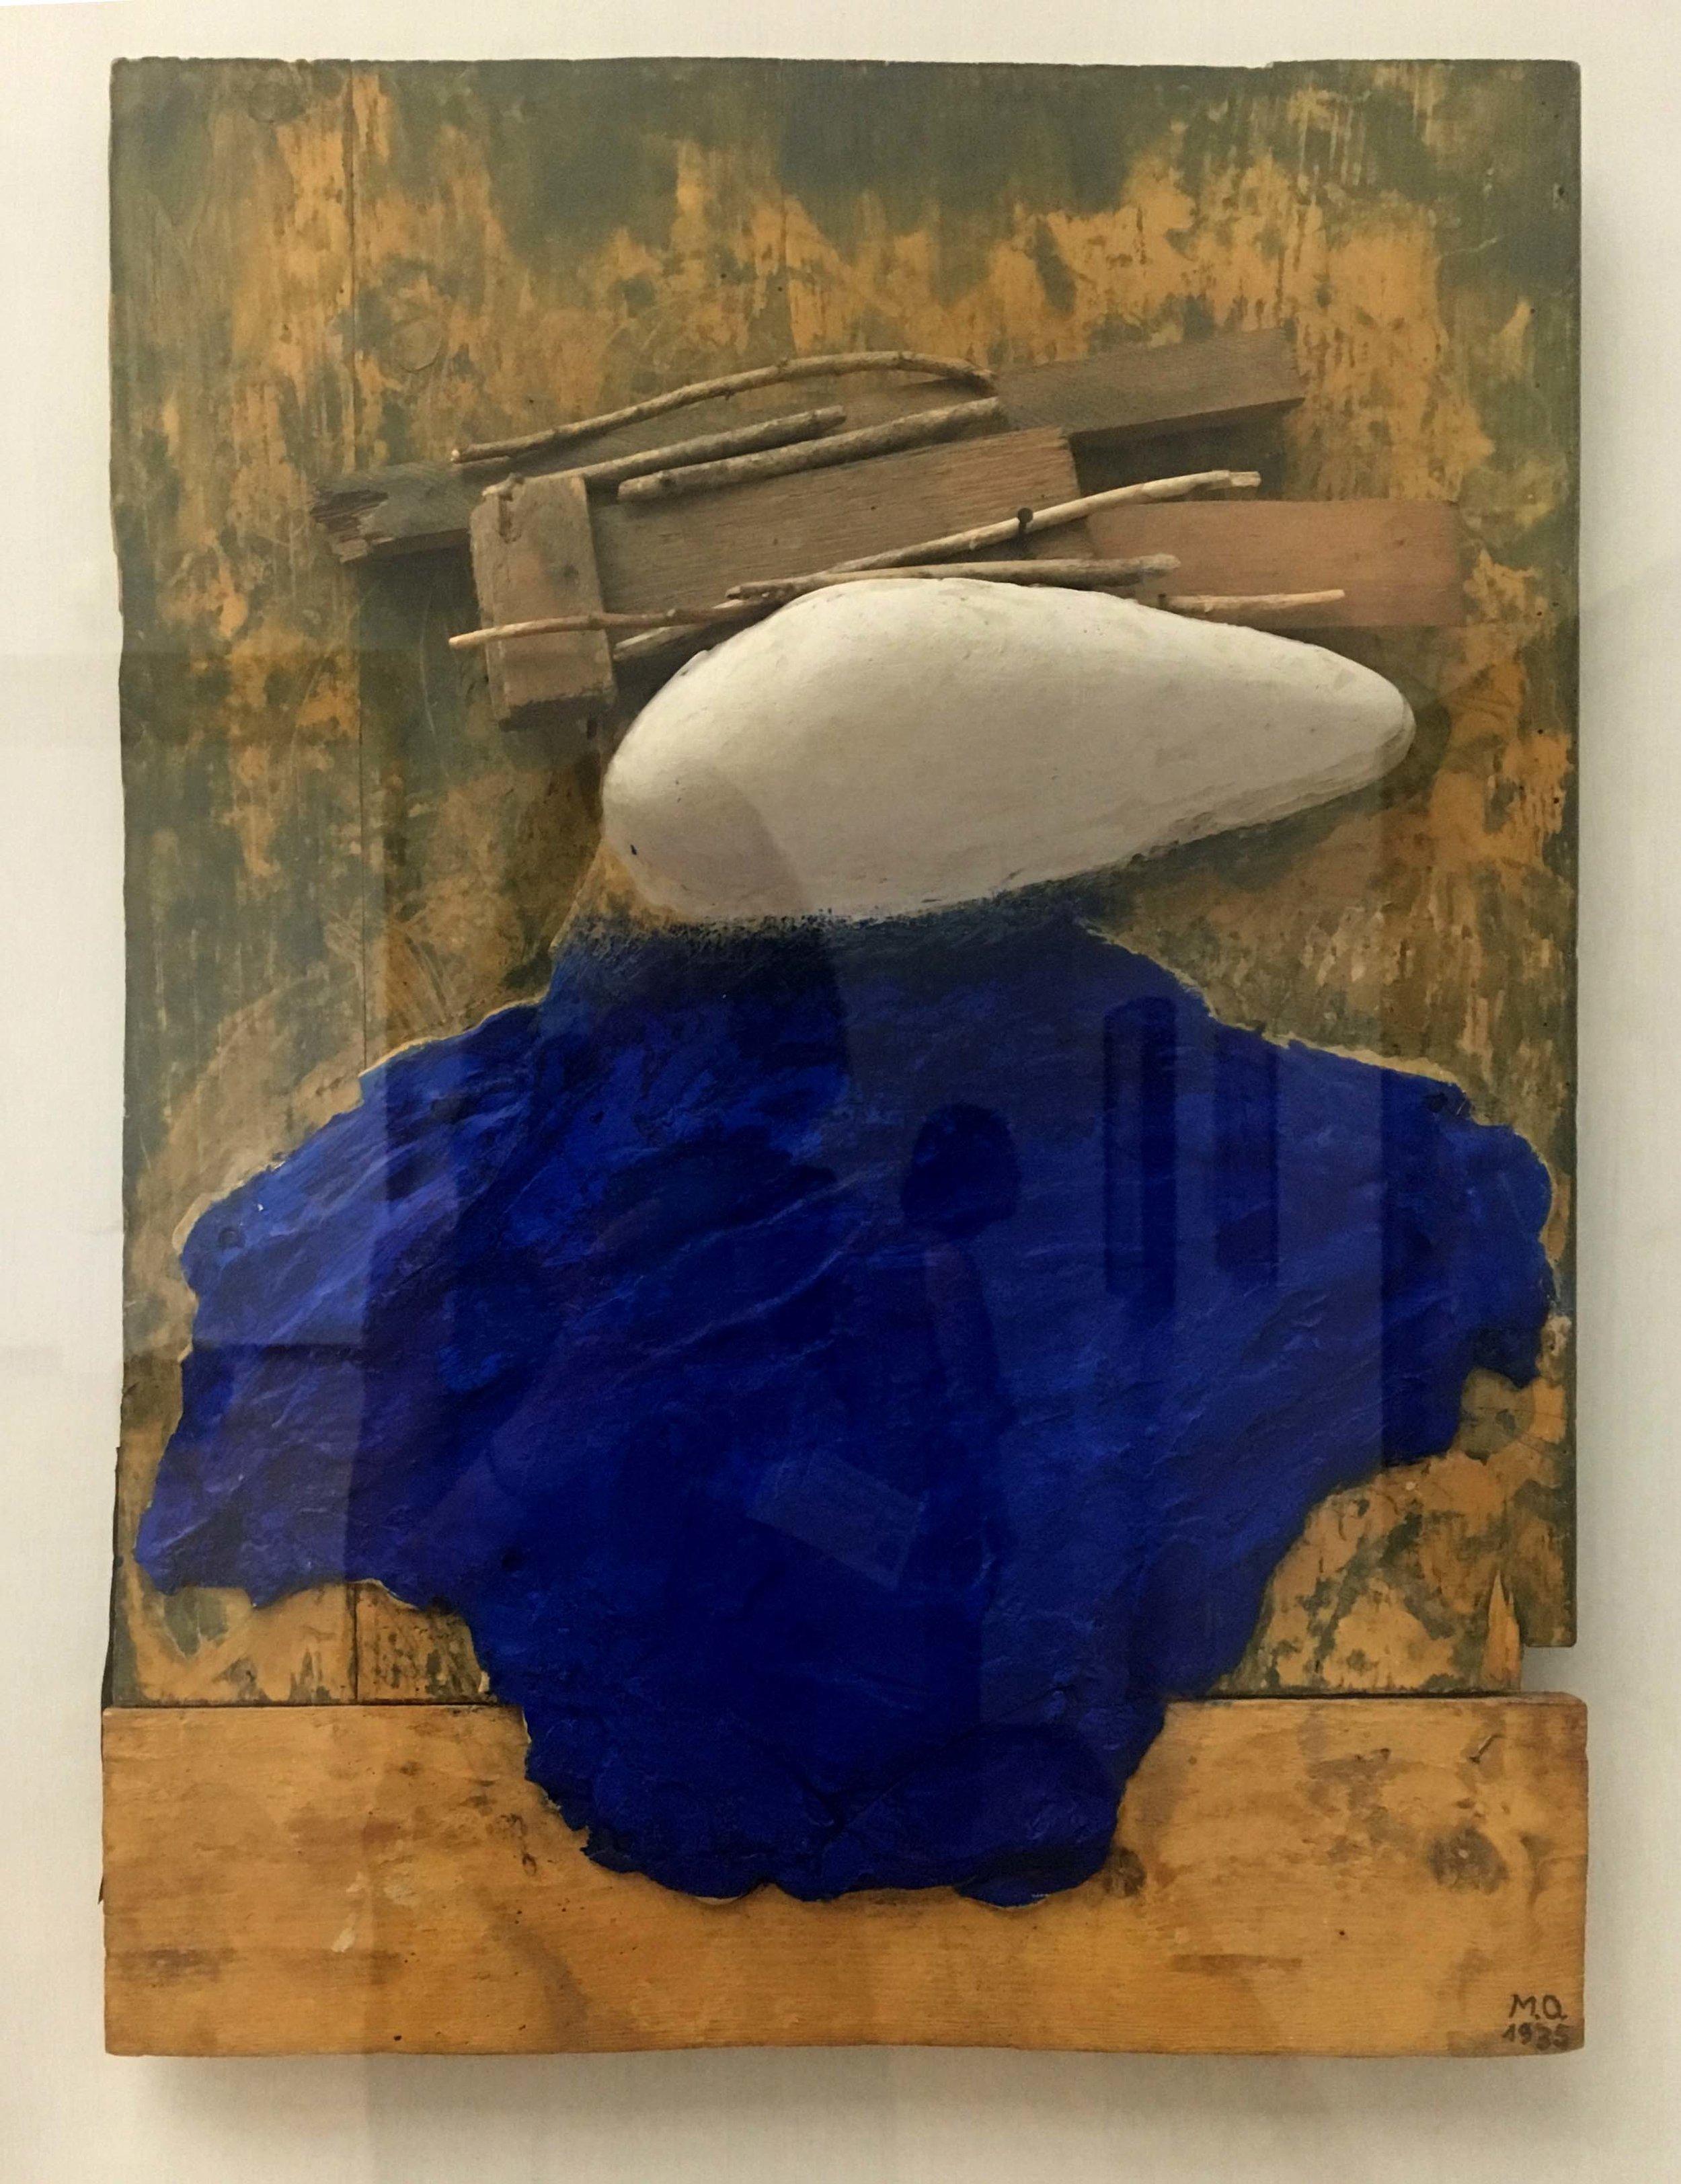 Meret Oppenheim, White head, blue garment, 1935